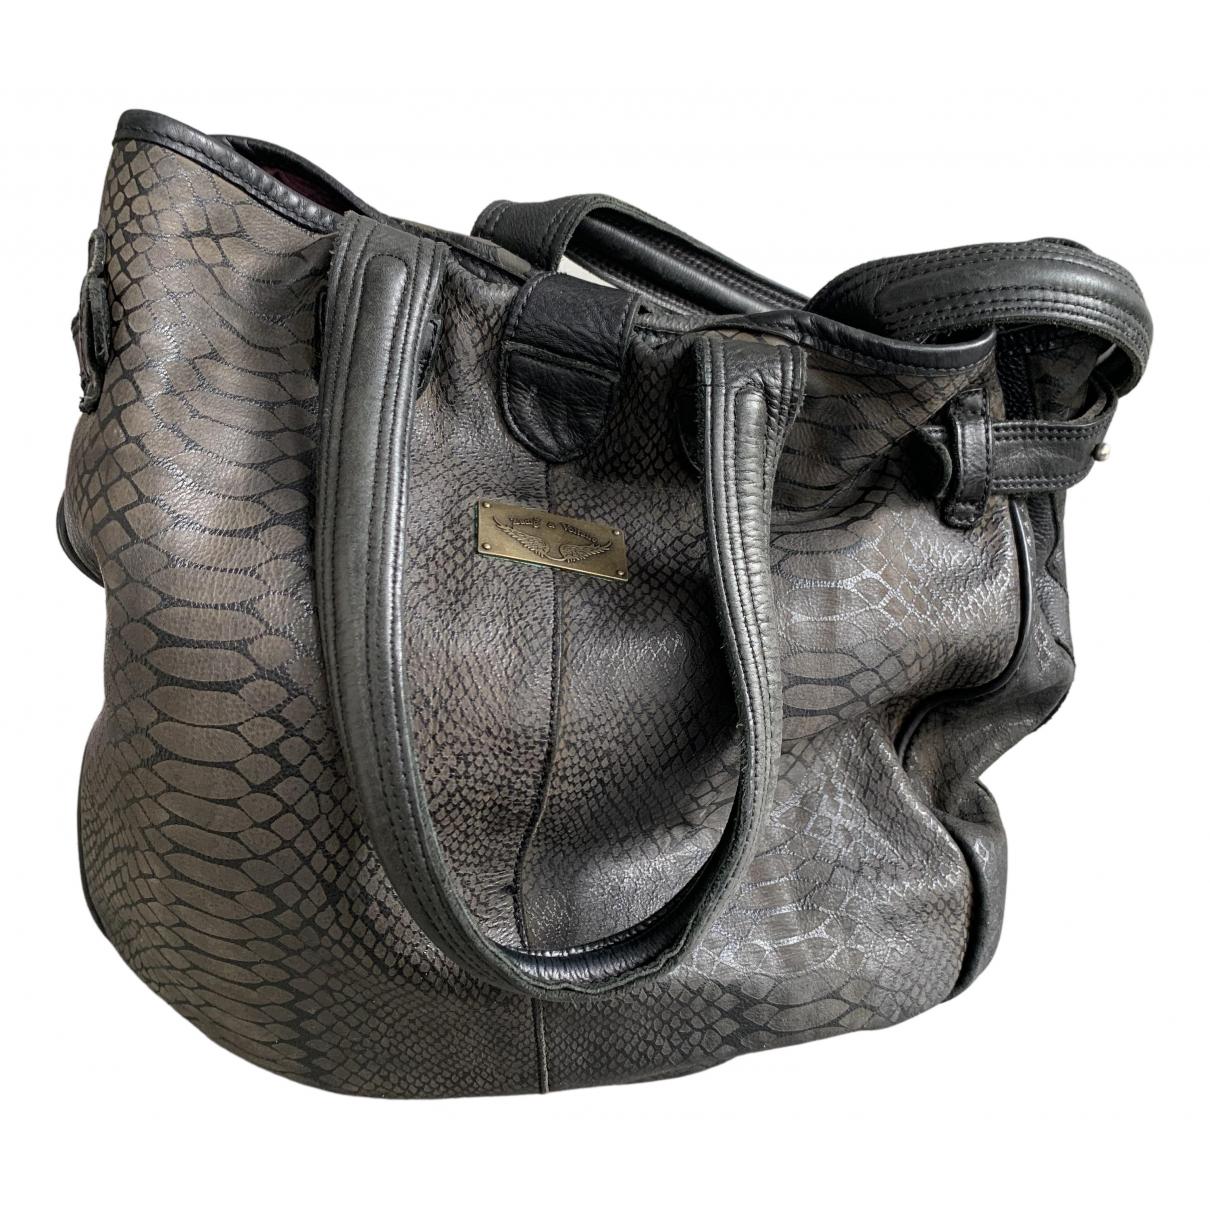 Zadig & Voltaire N Brown Leather handbag for Women N